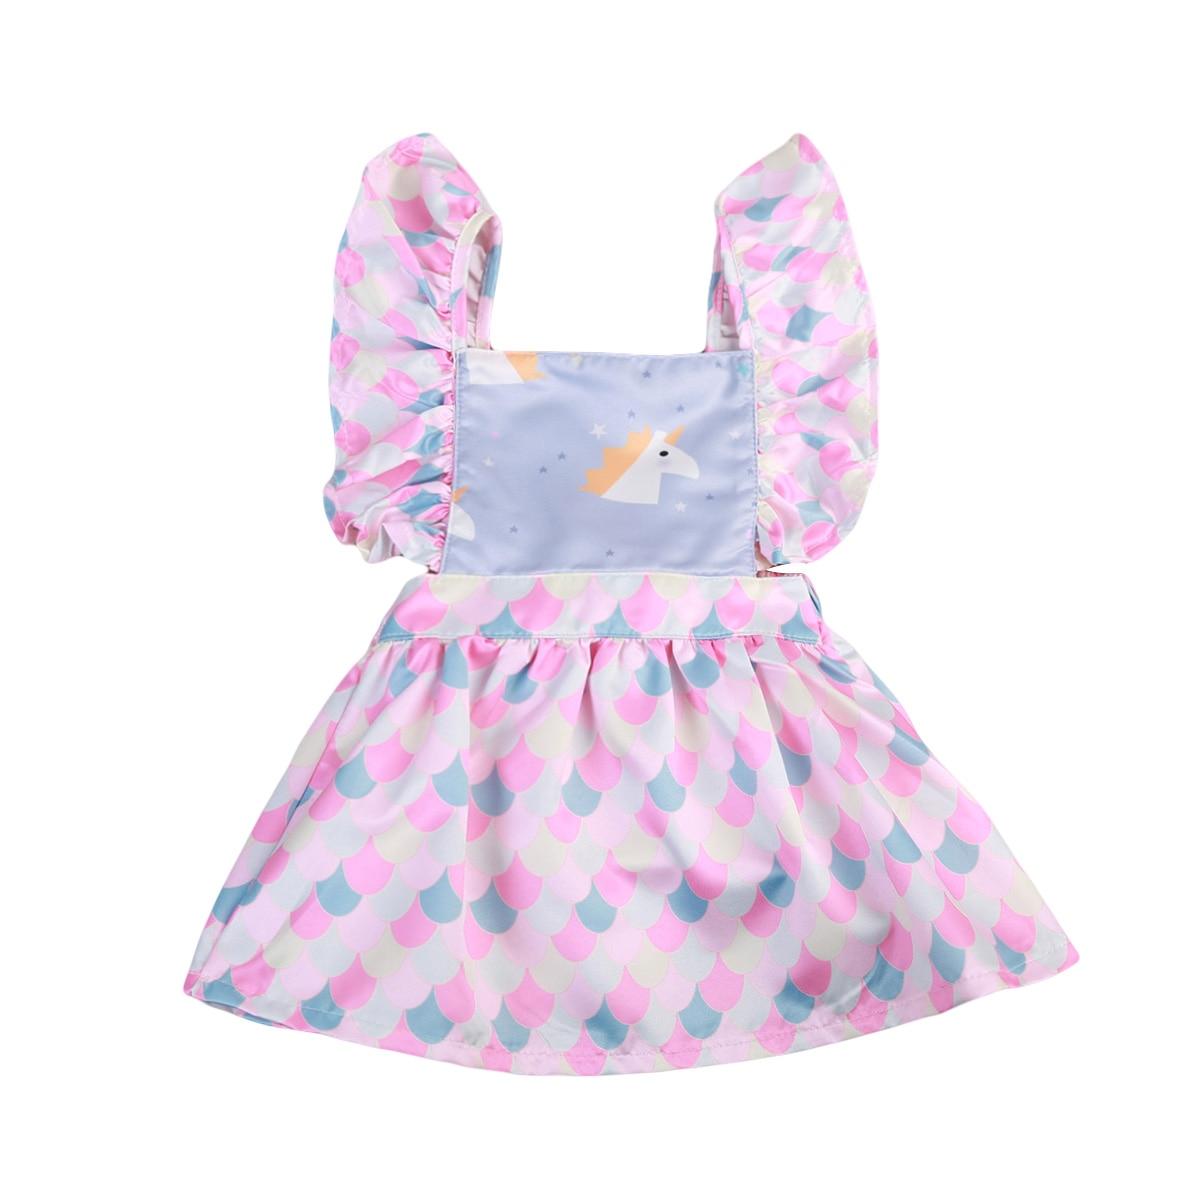 Fashion Unicorn Newborn Baby Girl Party Princess Prom Pageant Wedding Tutu Dress Cute Ruffles Sleeveless A-line Mini Dress